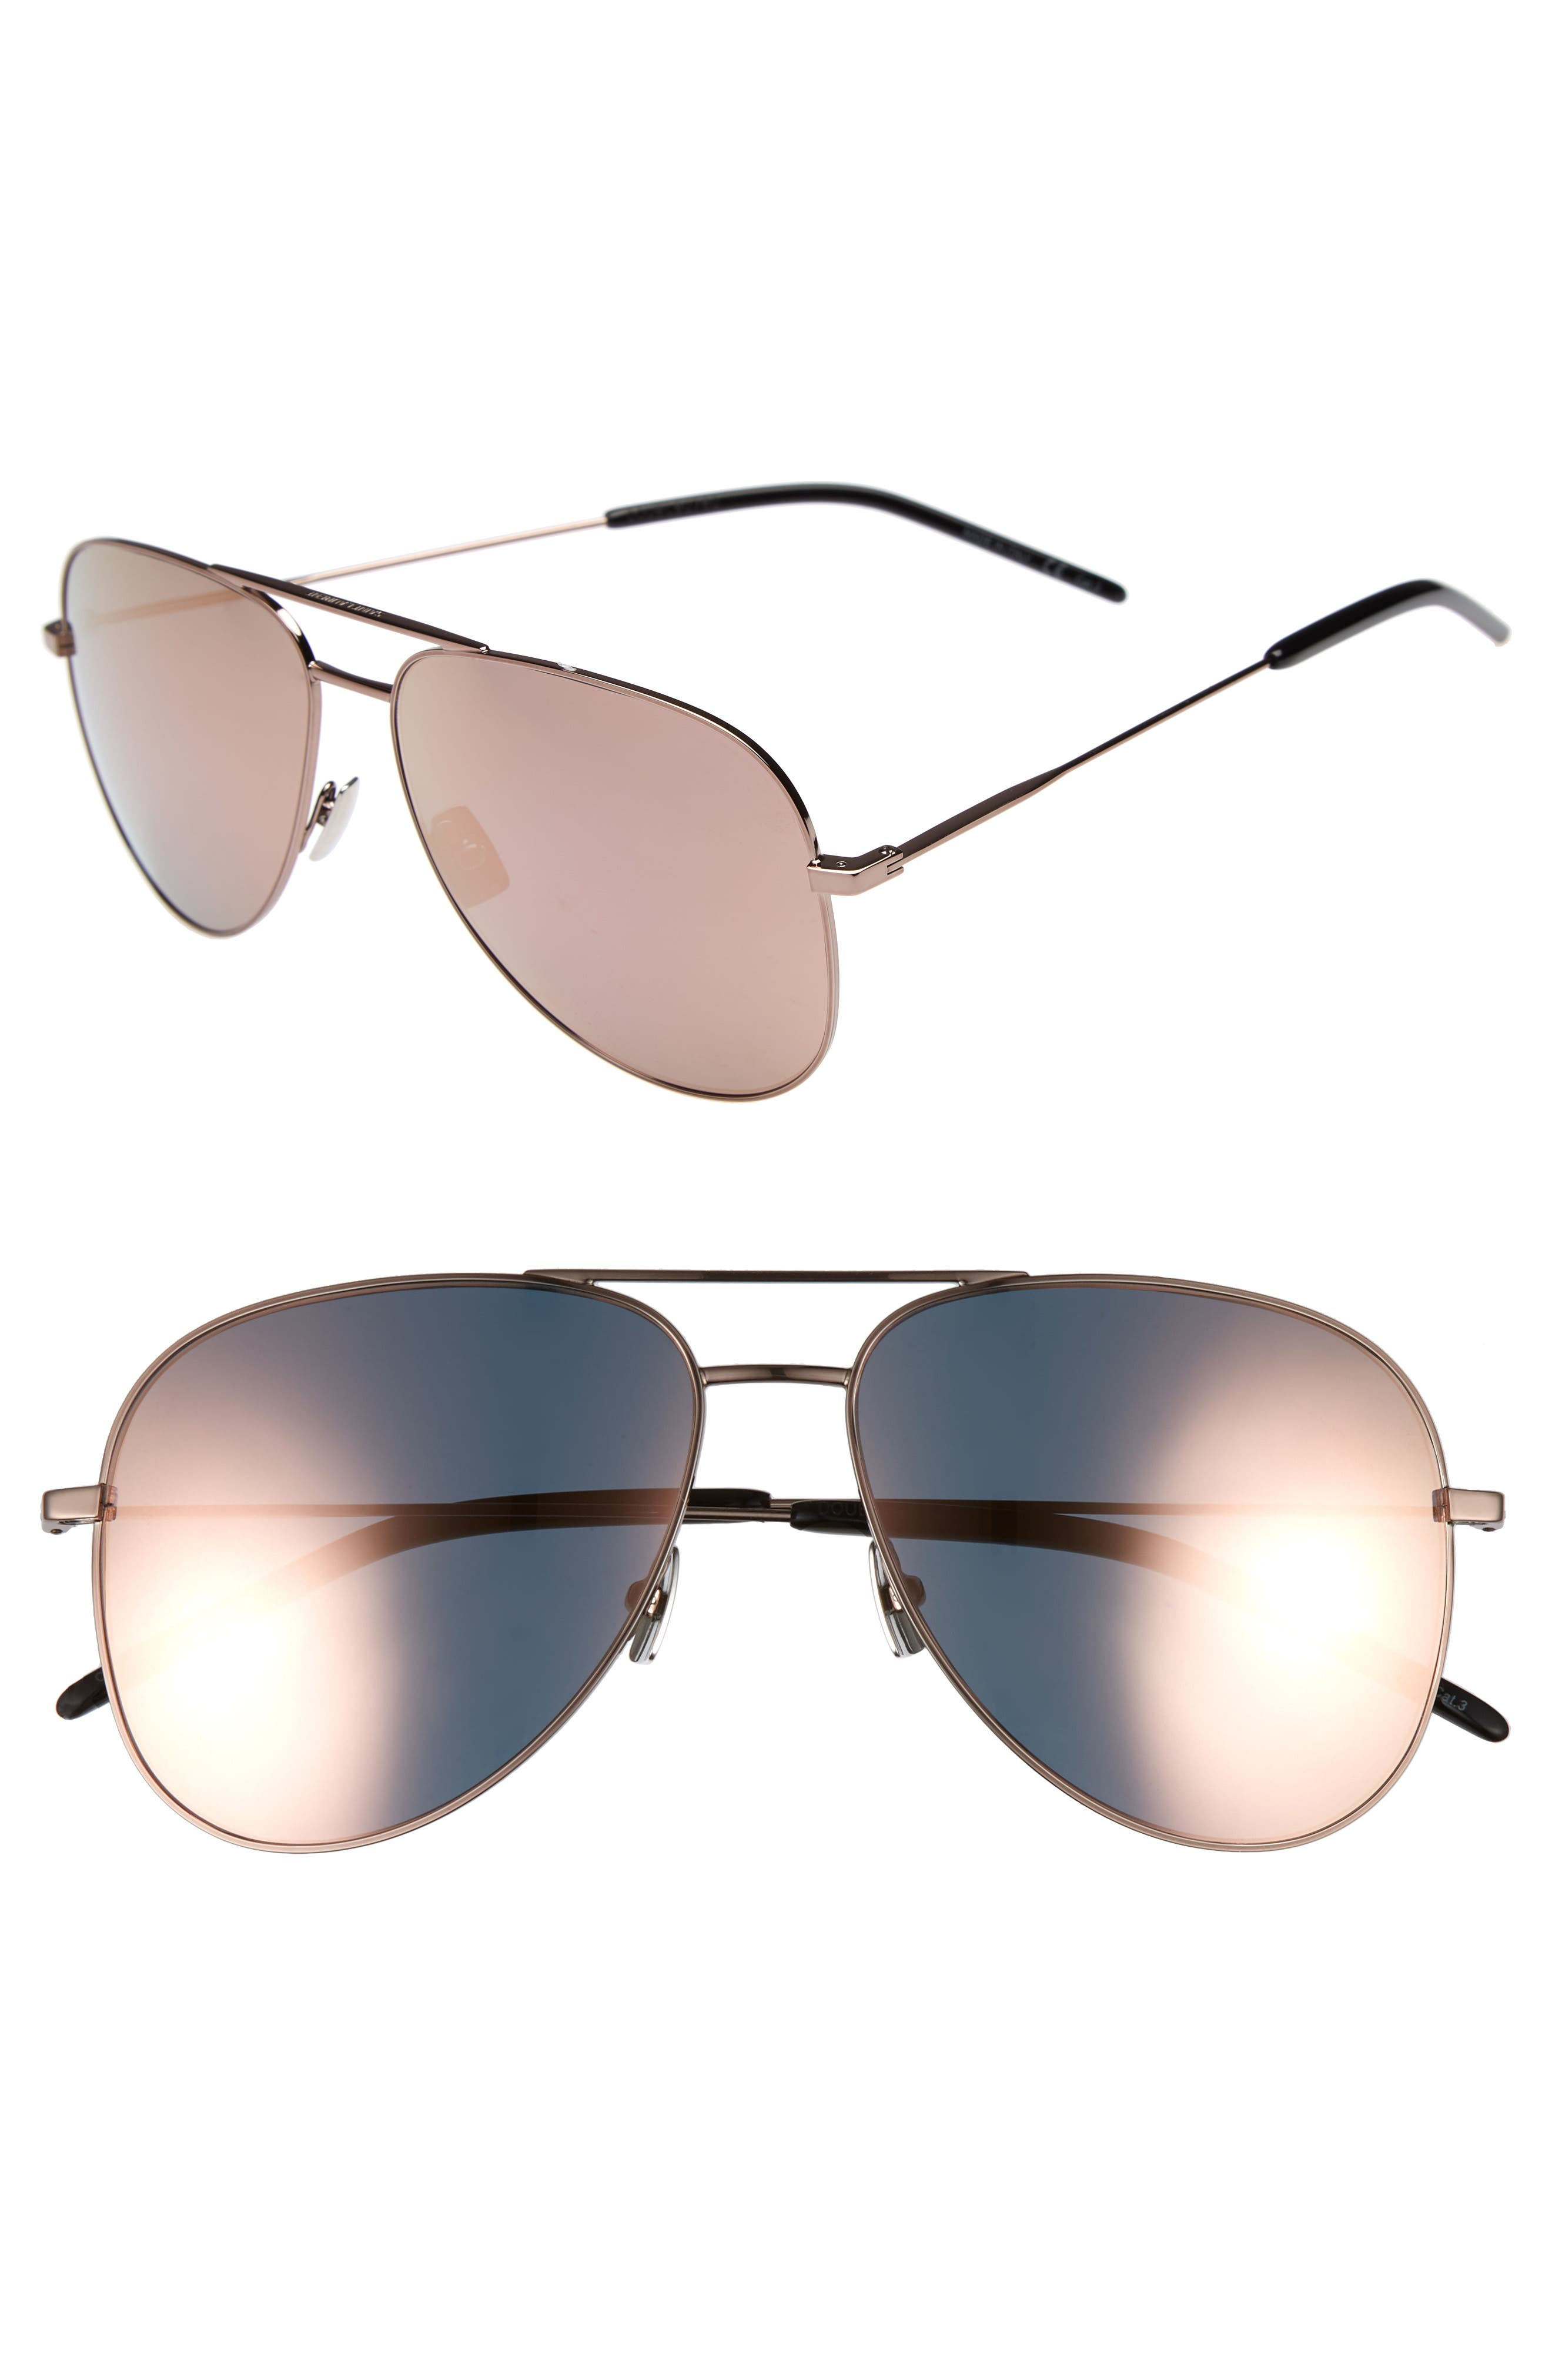 Saint Laurent Classic 11 59mm Aviator Sunglasses